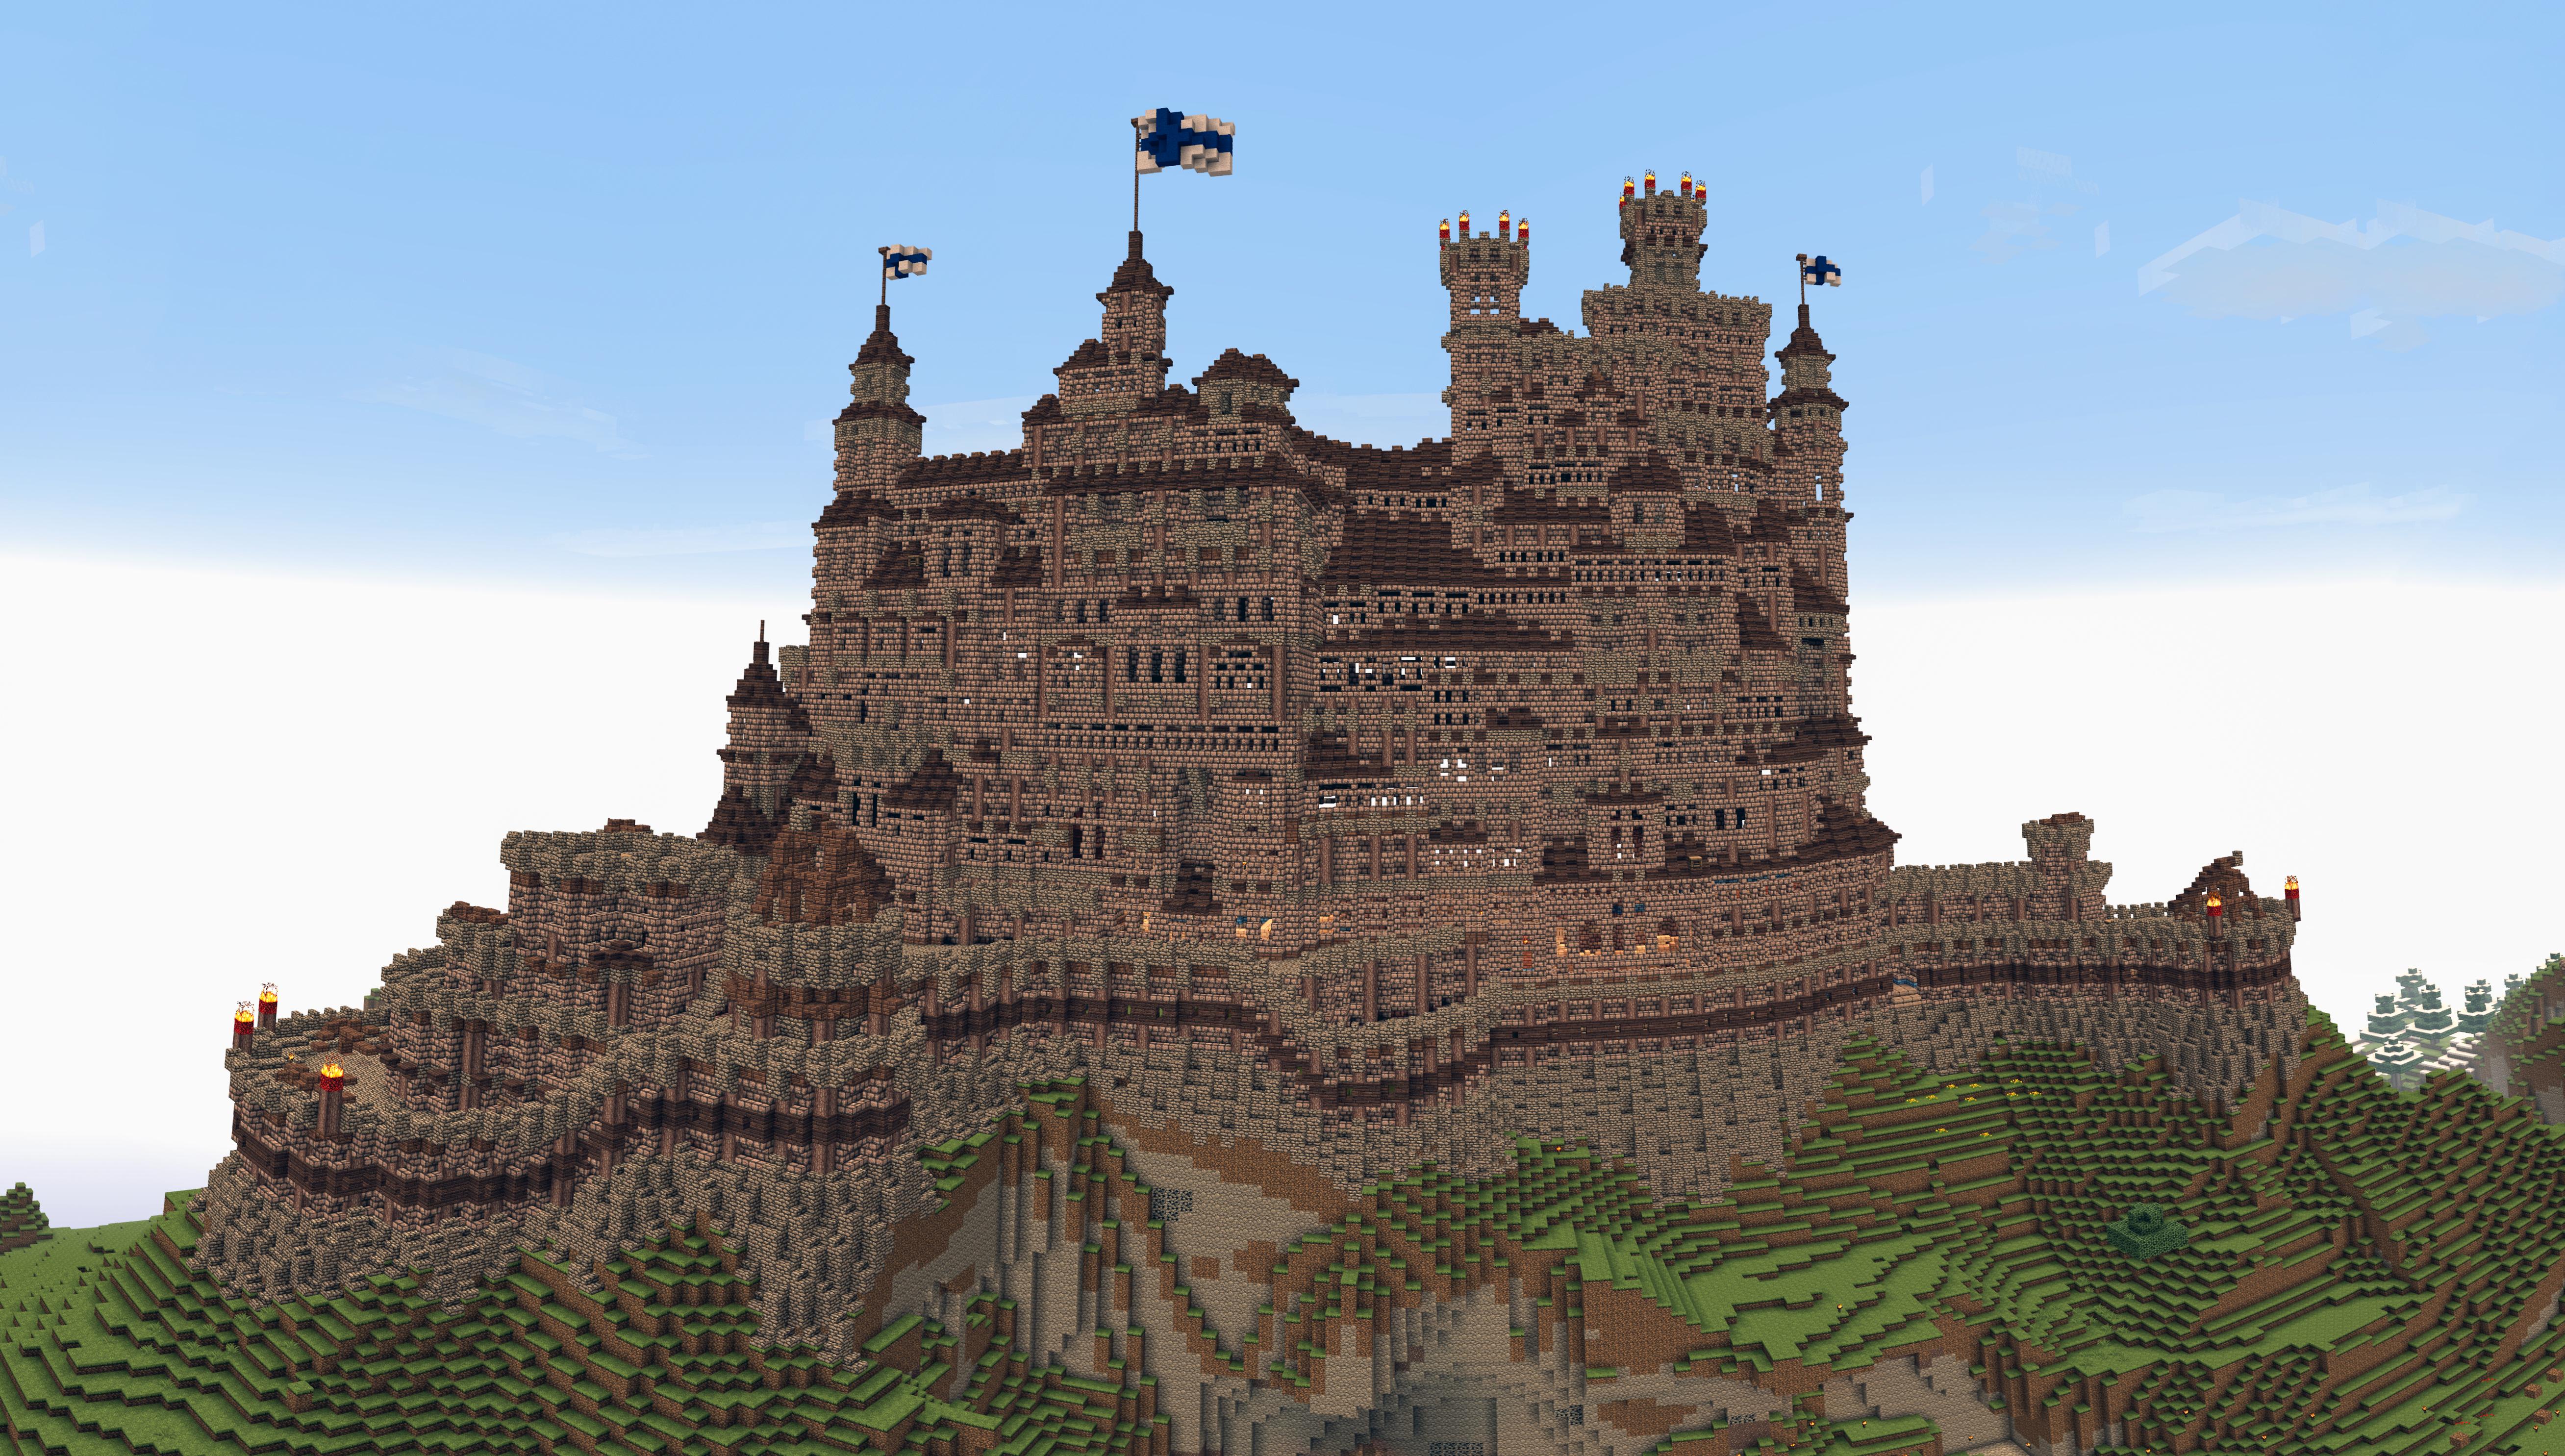 Castle something